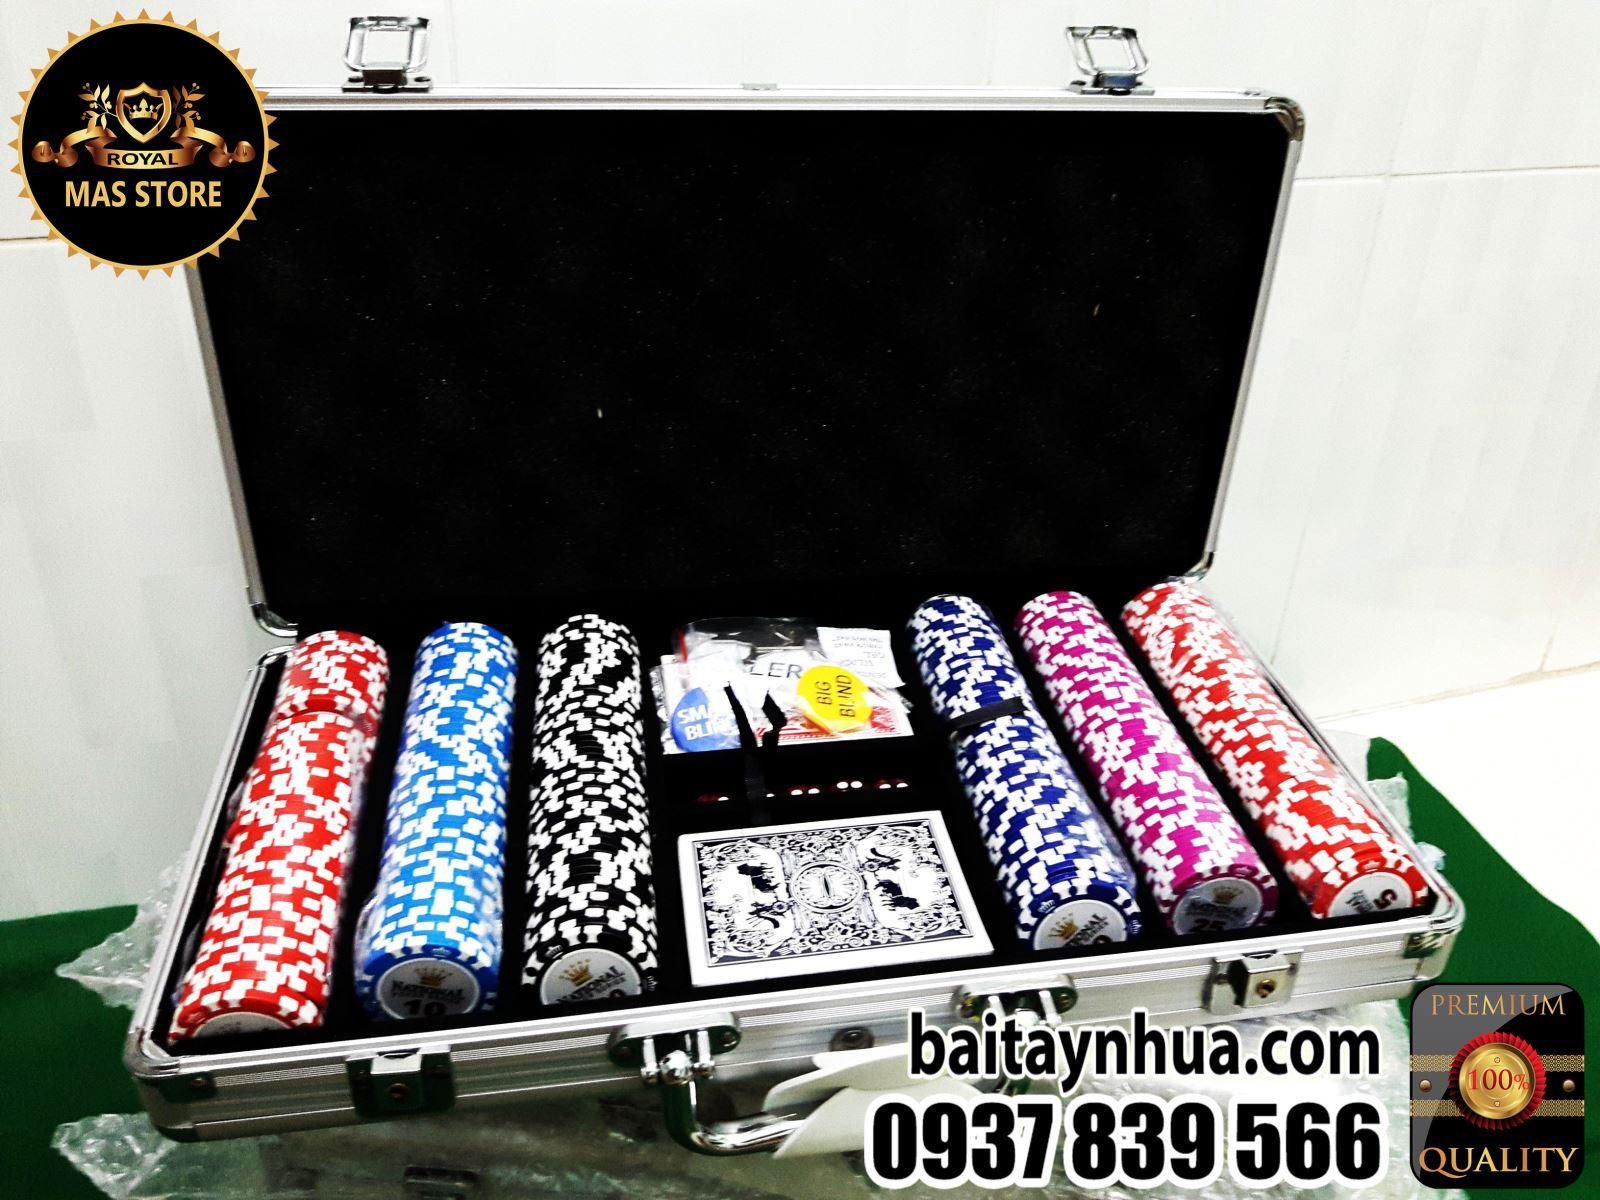 300 Phỉnh Poker National Cao Cấp Có Số